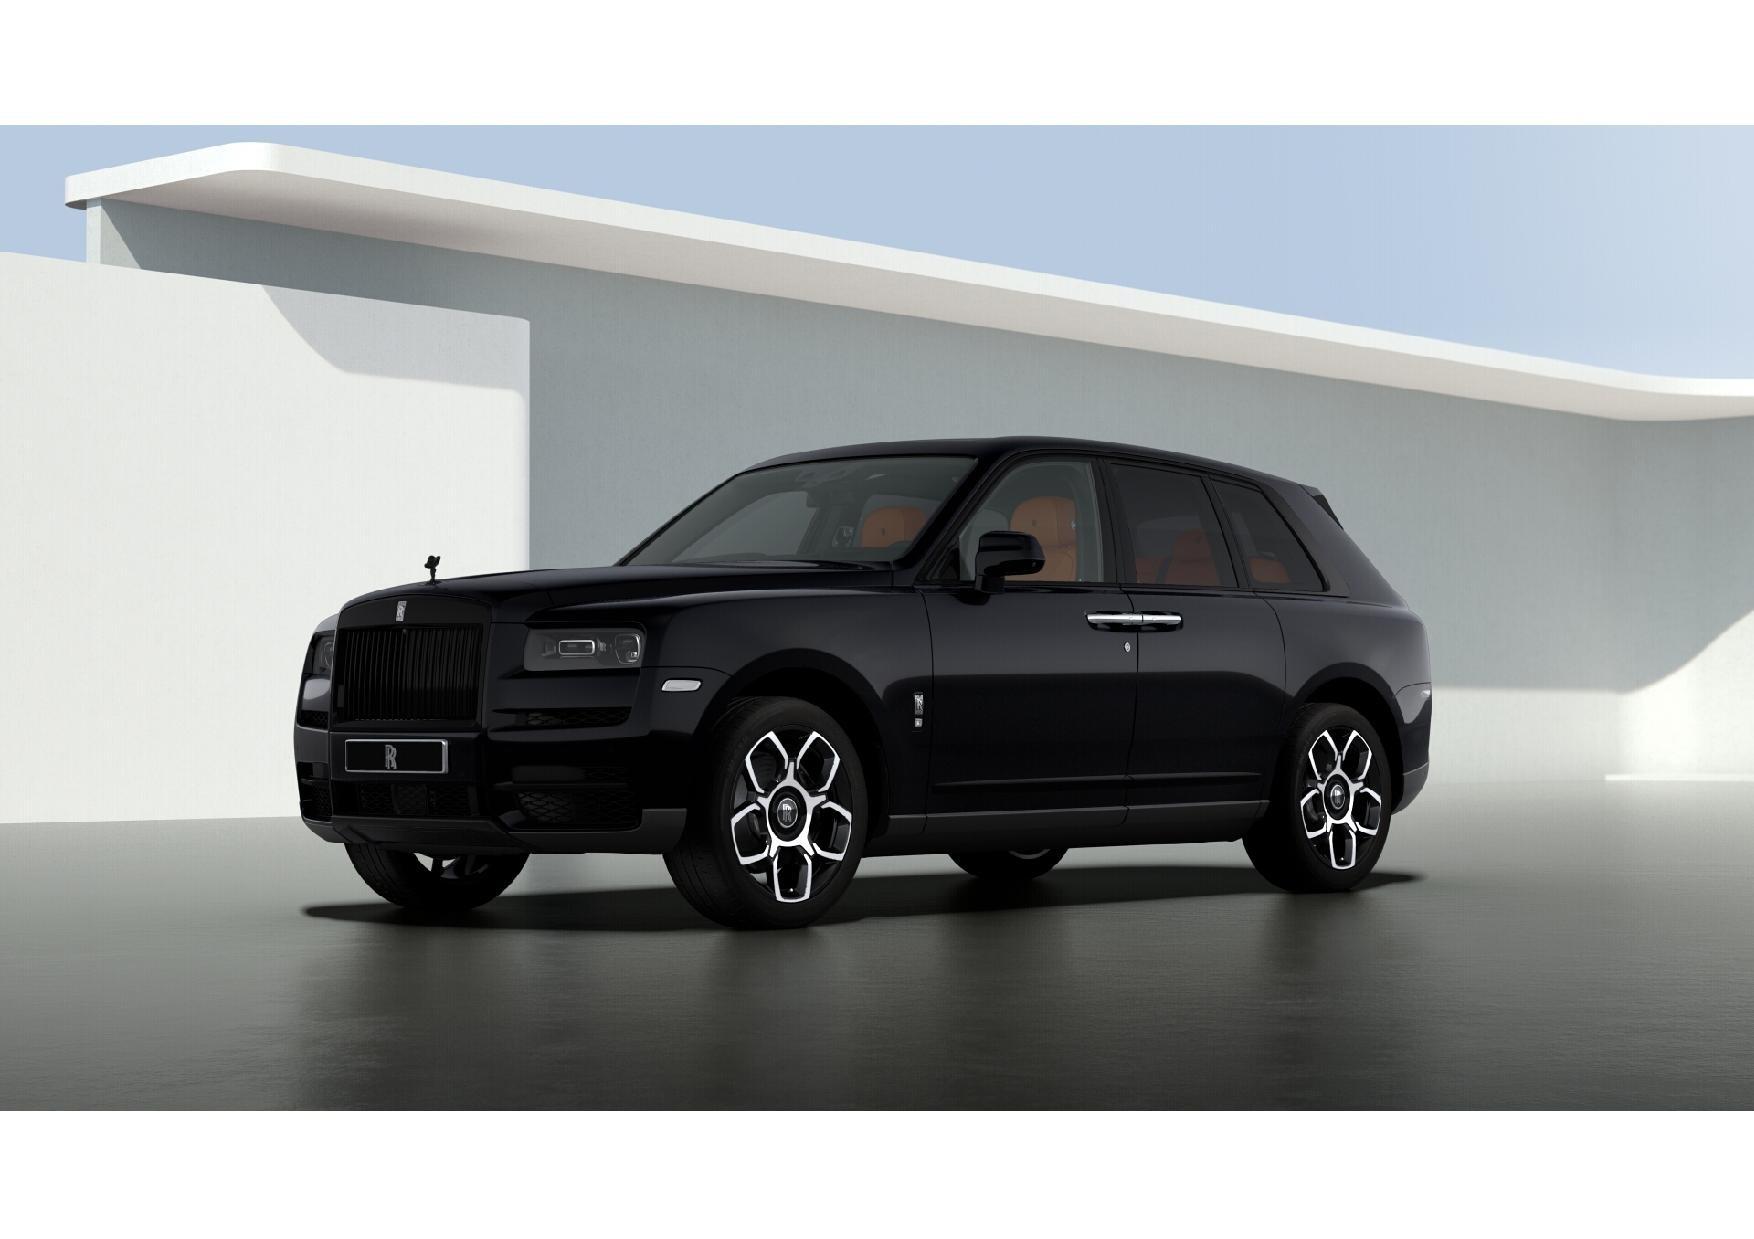 New 2021 Rolls-Royce Cullinan Black Badge for sale $433,225 at Maserati of Westport in Westport CT 06880 1